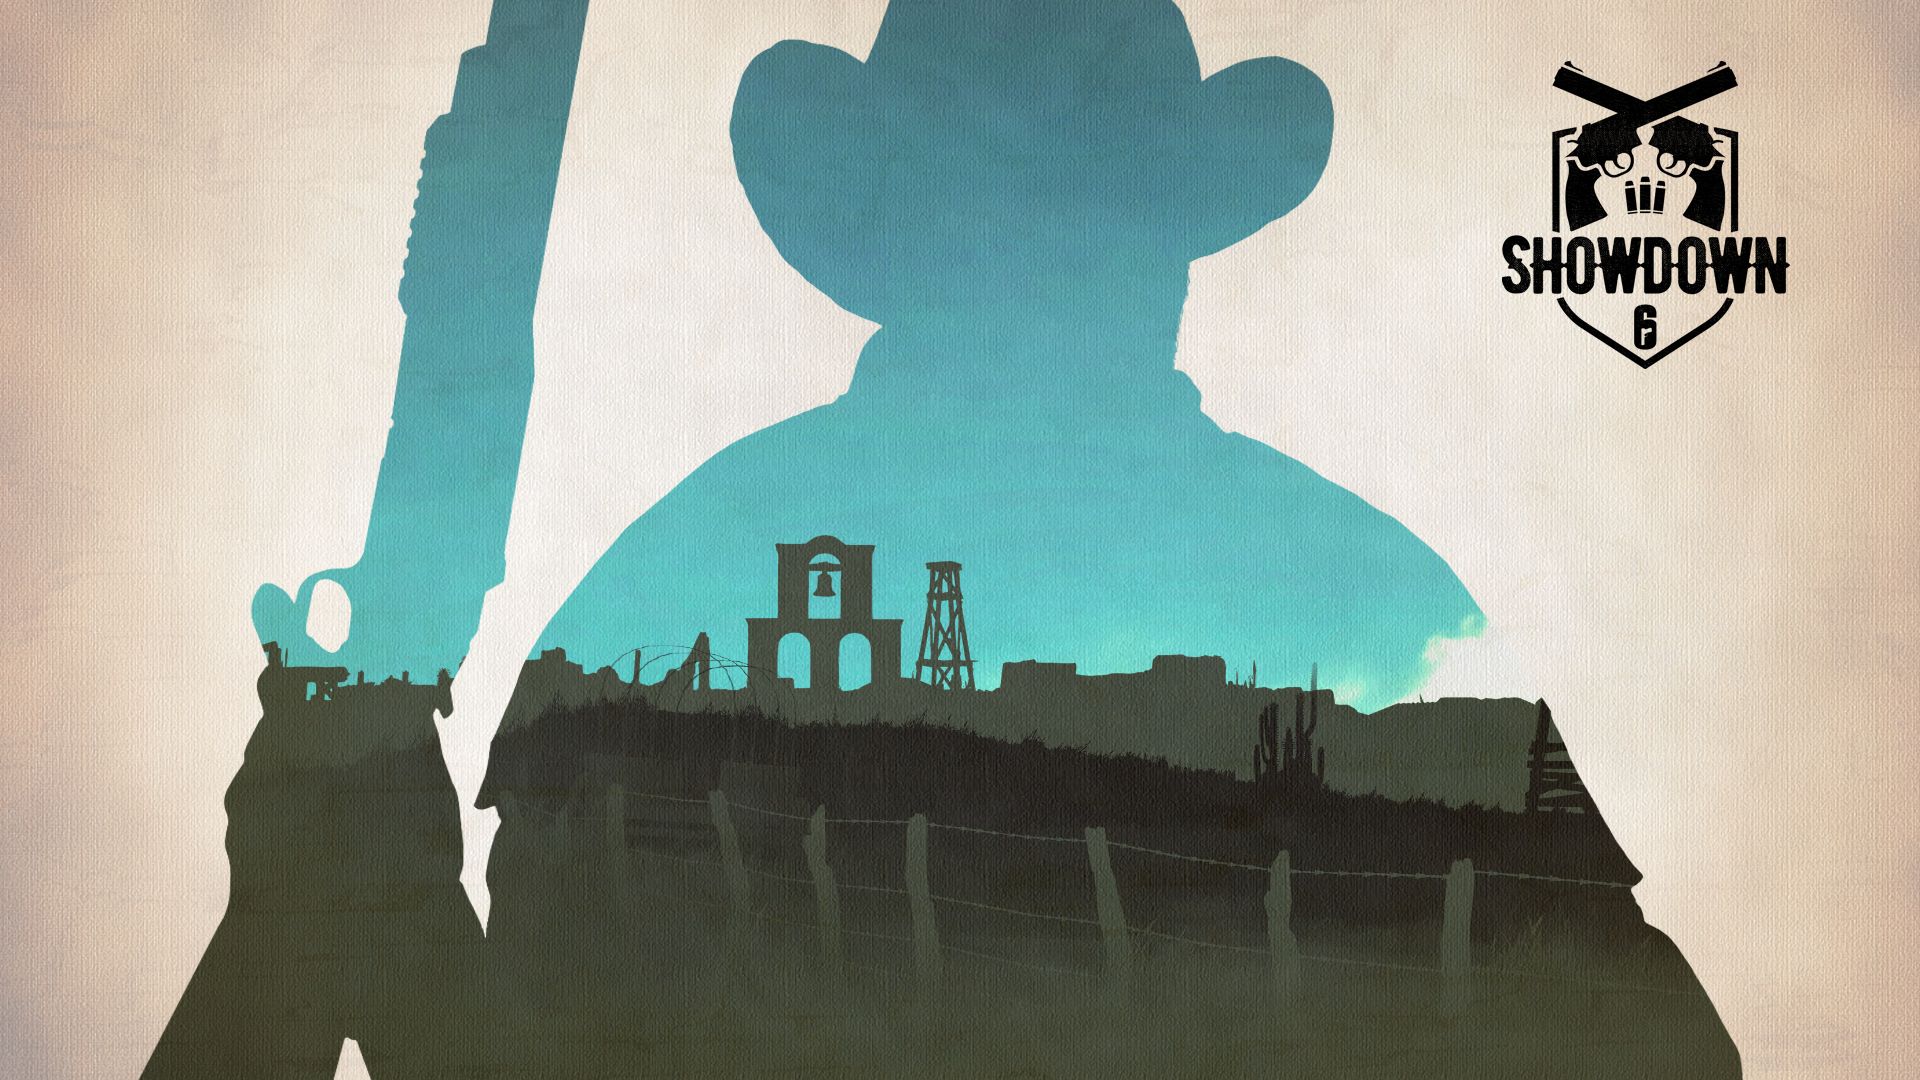 Play cowboys in Rainbow Six Siege's Showdown mode